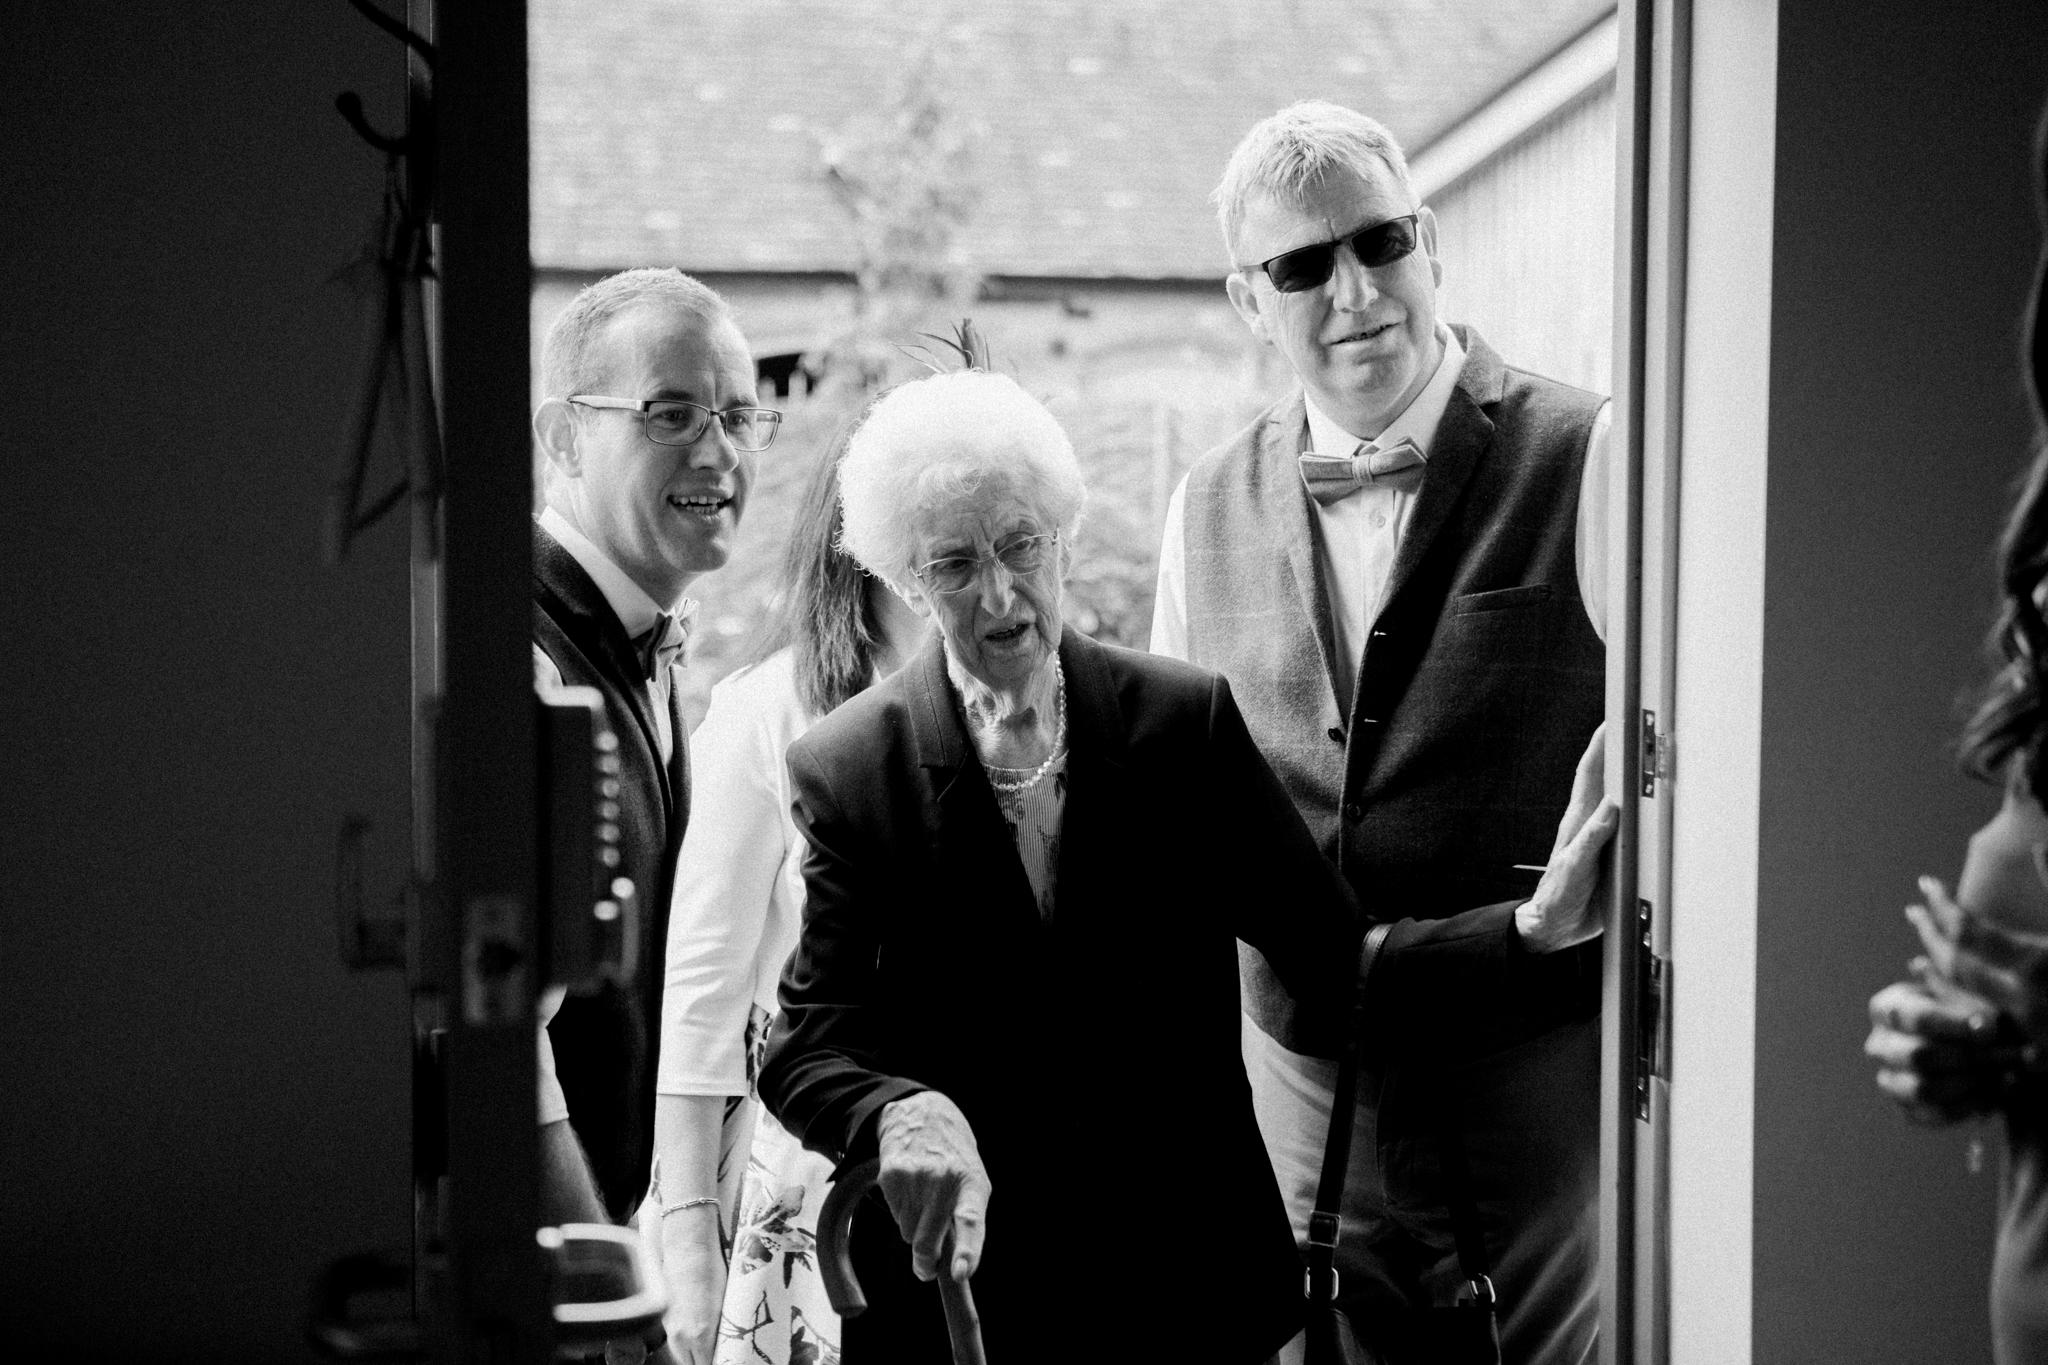 Rowsie & Lee, Swallows Nest Barn Wedding, Cotswold wedding photographer, Warwickshire Wedding Photographer-35.jpg